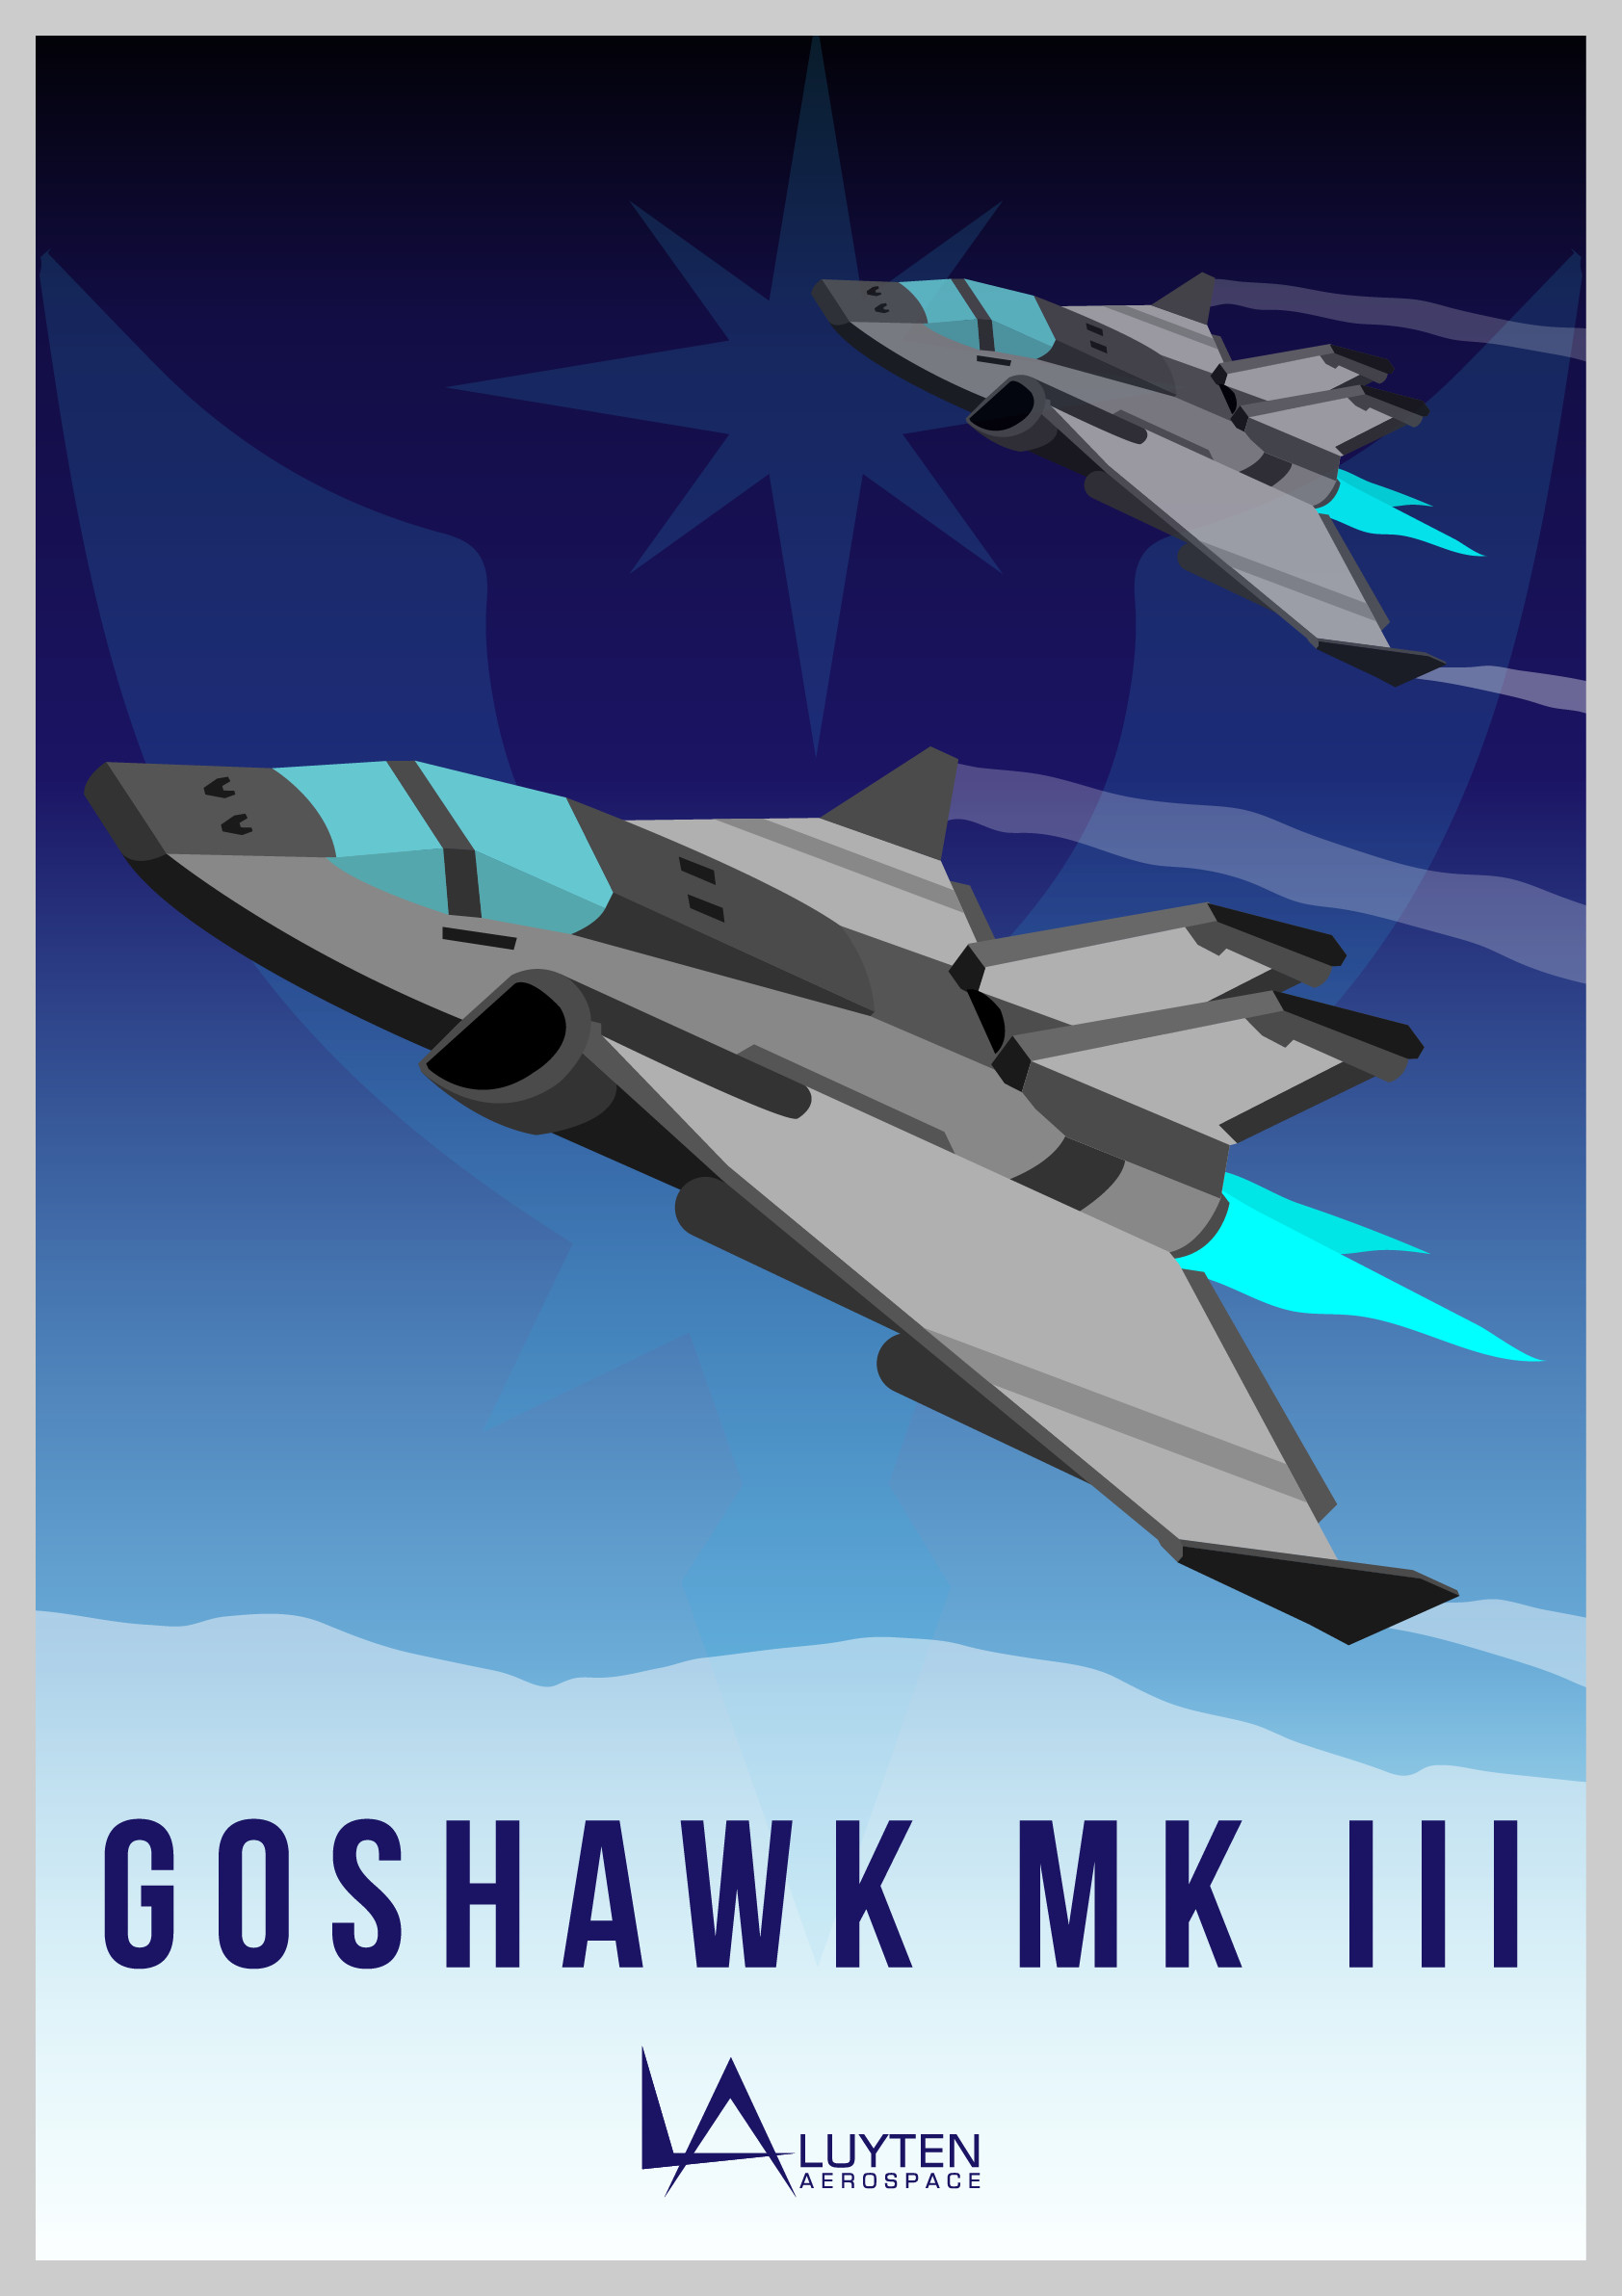 Mathew maddison goshawk mk iii altair 01